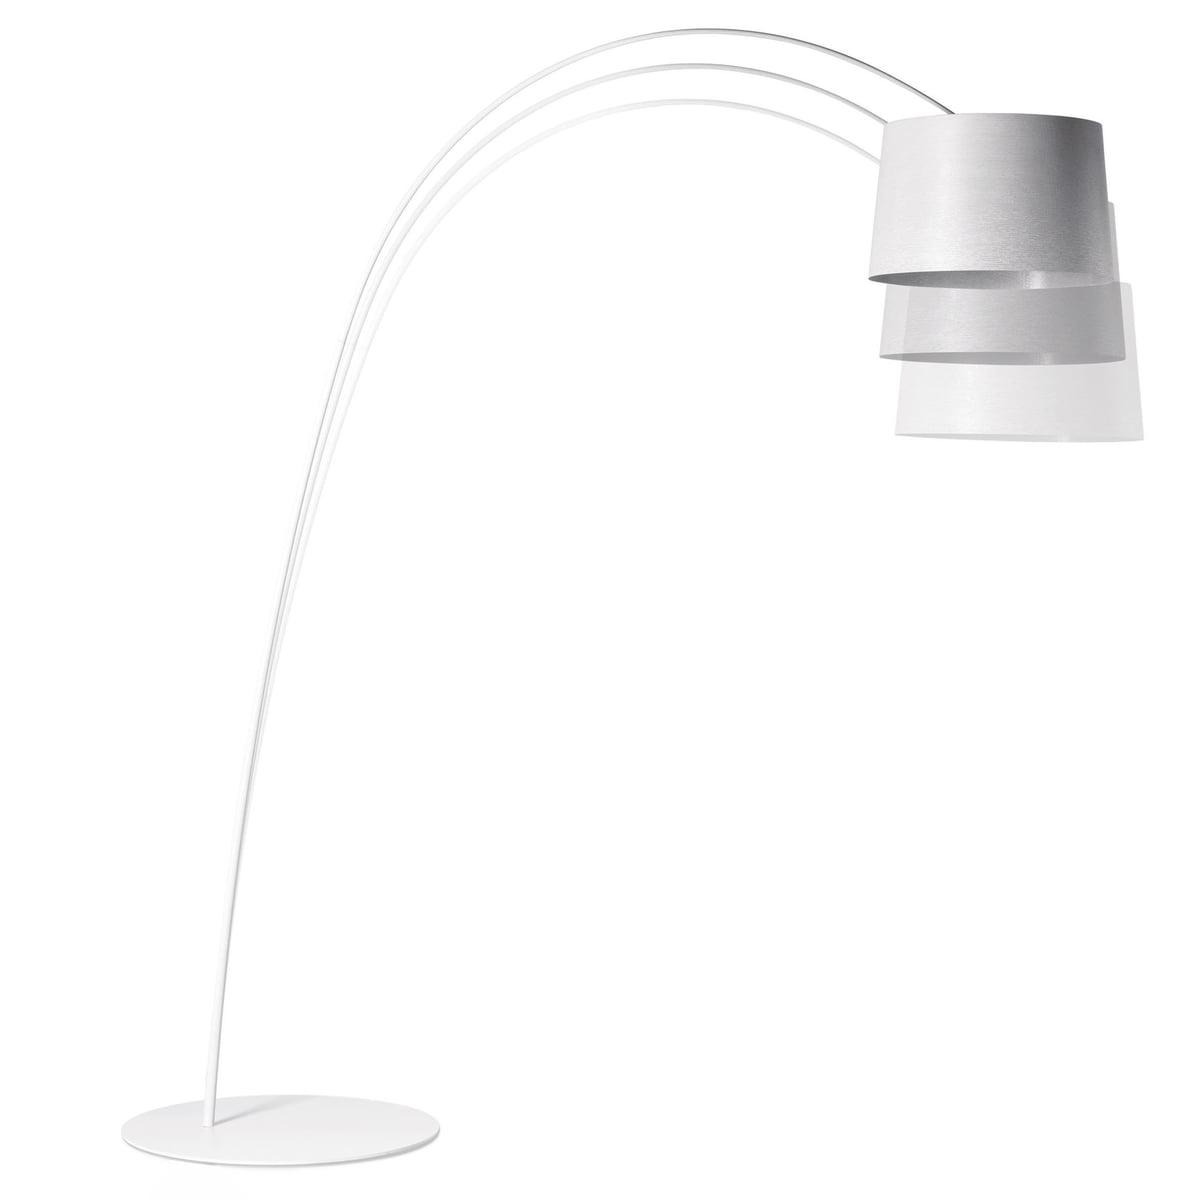 The Twiggy LED Gooseneck Lamp By Foscarini